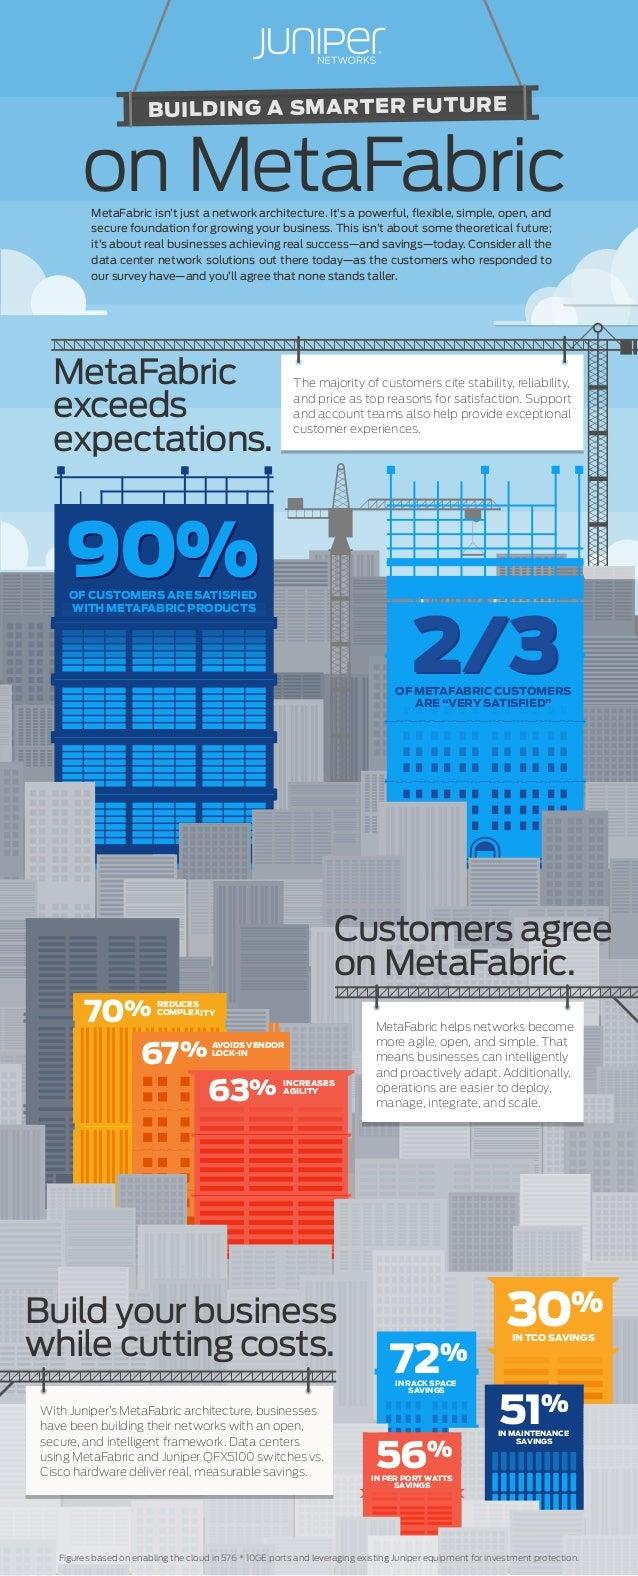 Infographic: 90% MetaFabric Customer Satisfaction